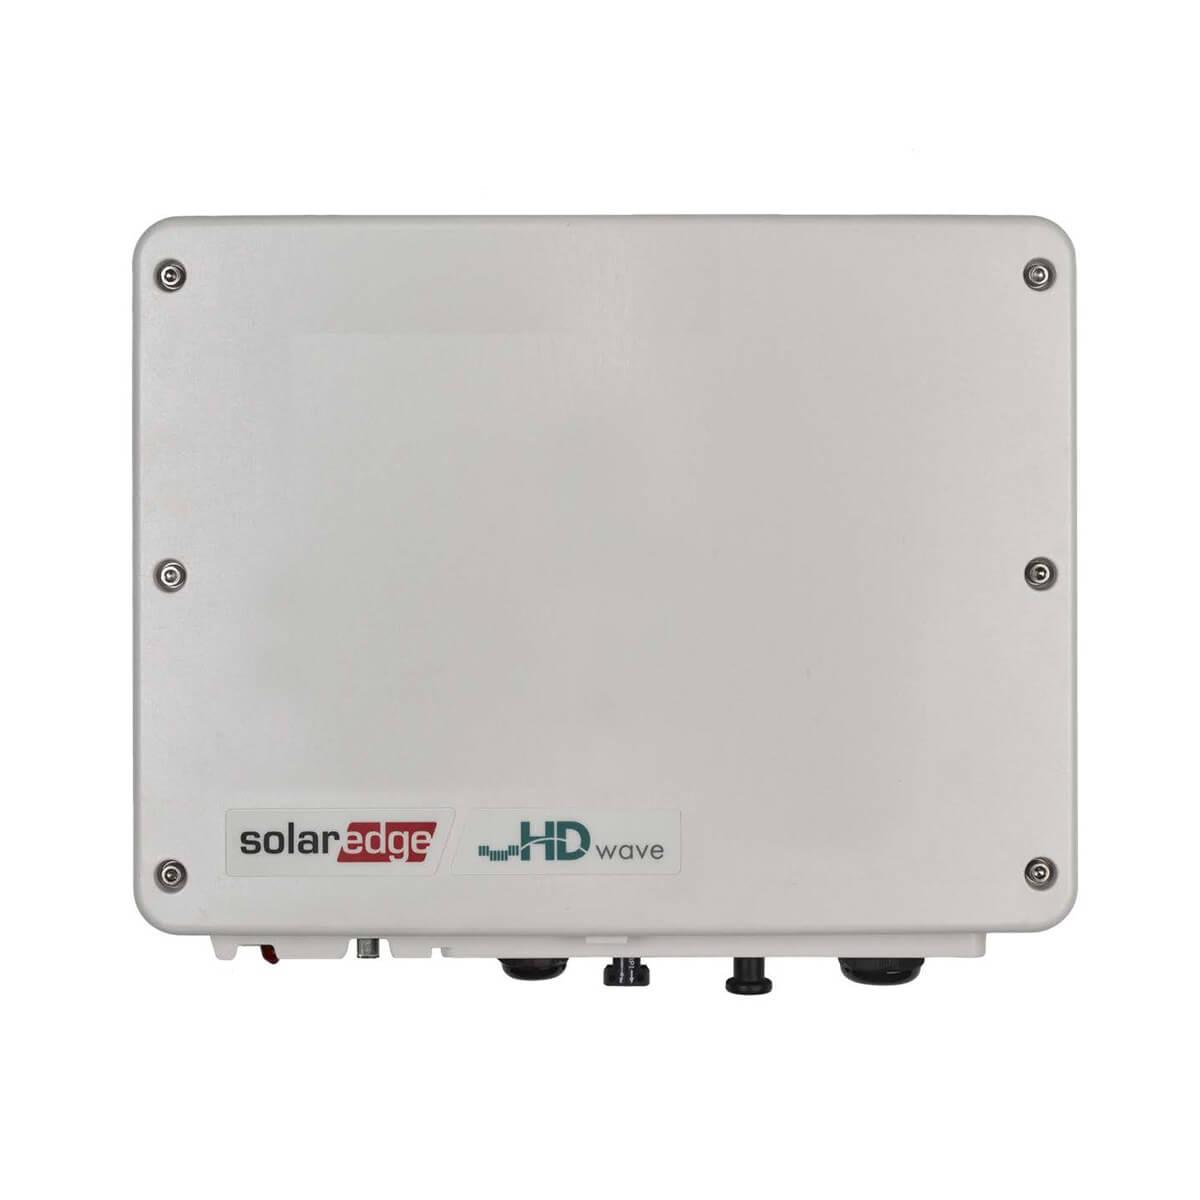 solaredge 3.5kW inverter, solaredge se3500h 3.5kW inverter, solaredge se3500h inverter, solaredge se3500h, solaredge 3.5 kW, SOLAREDGE 3.5 KW